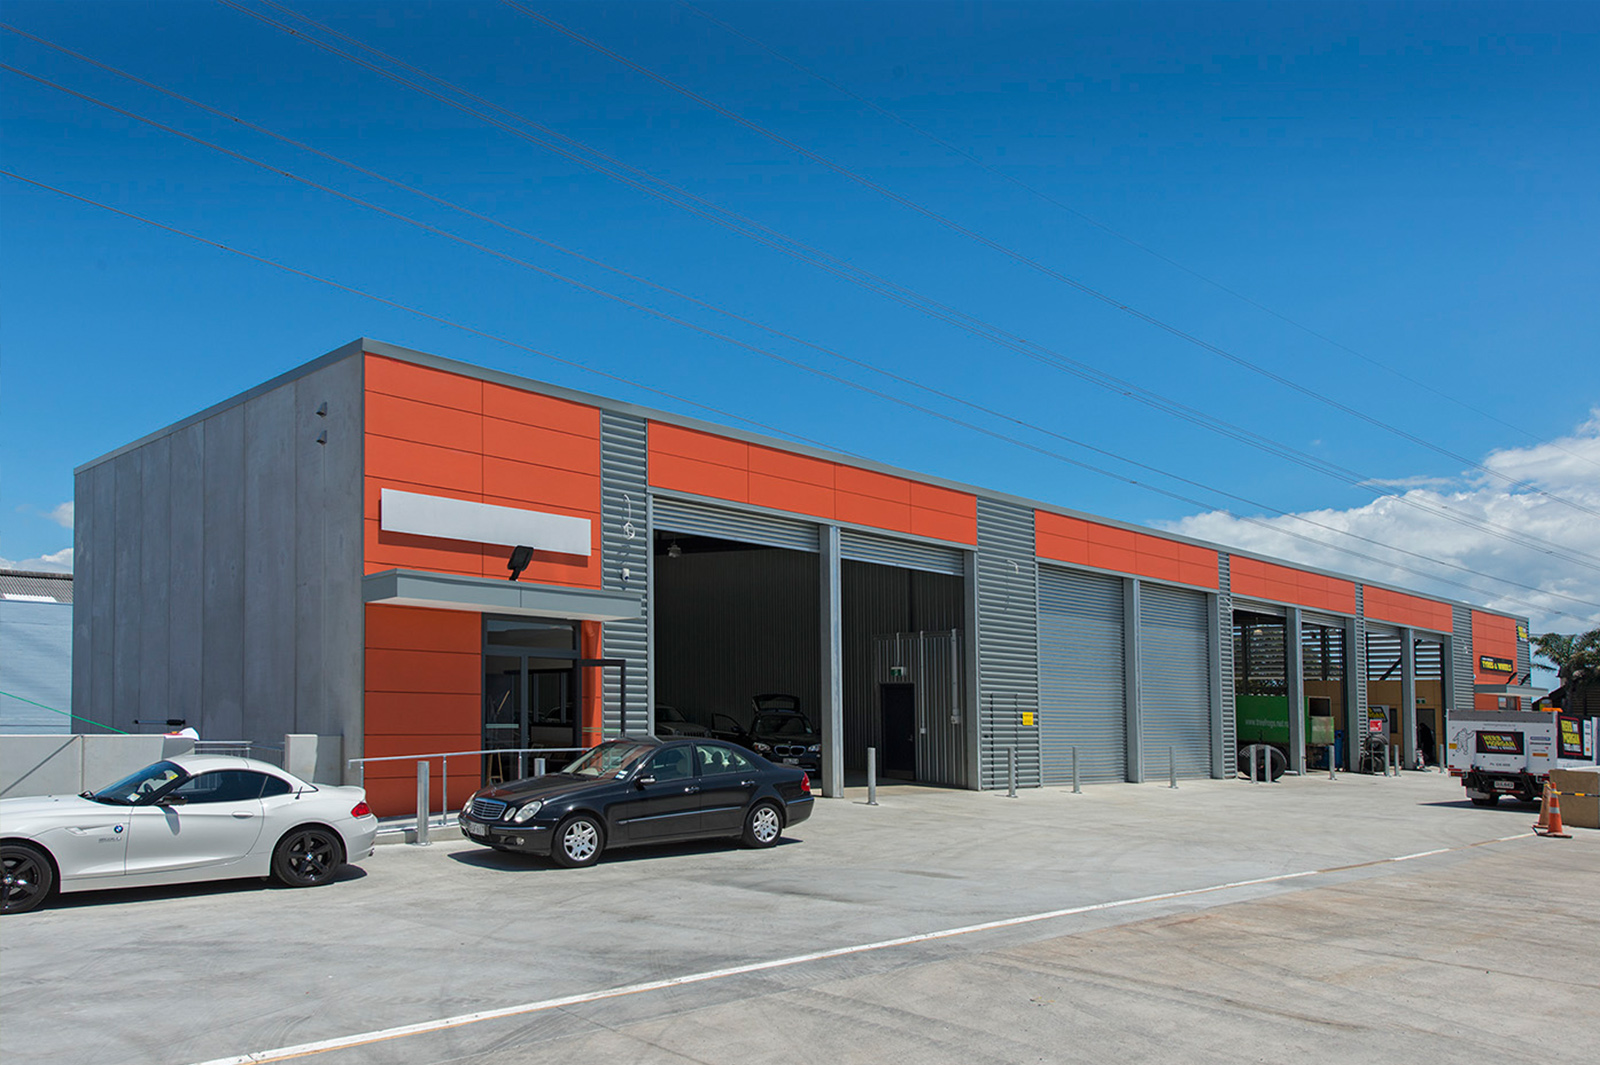 Retail and warehousing developer